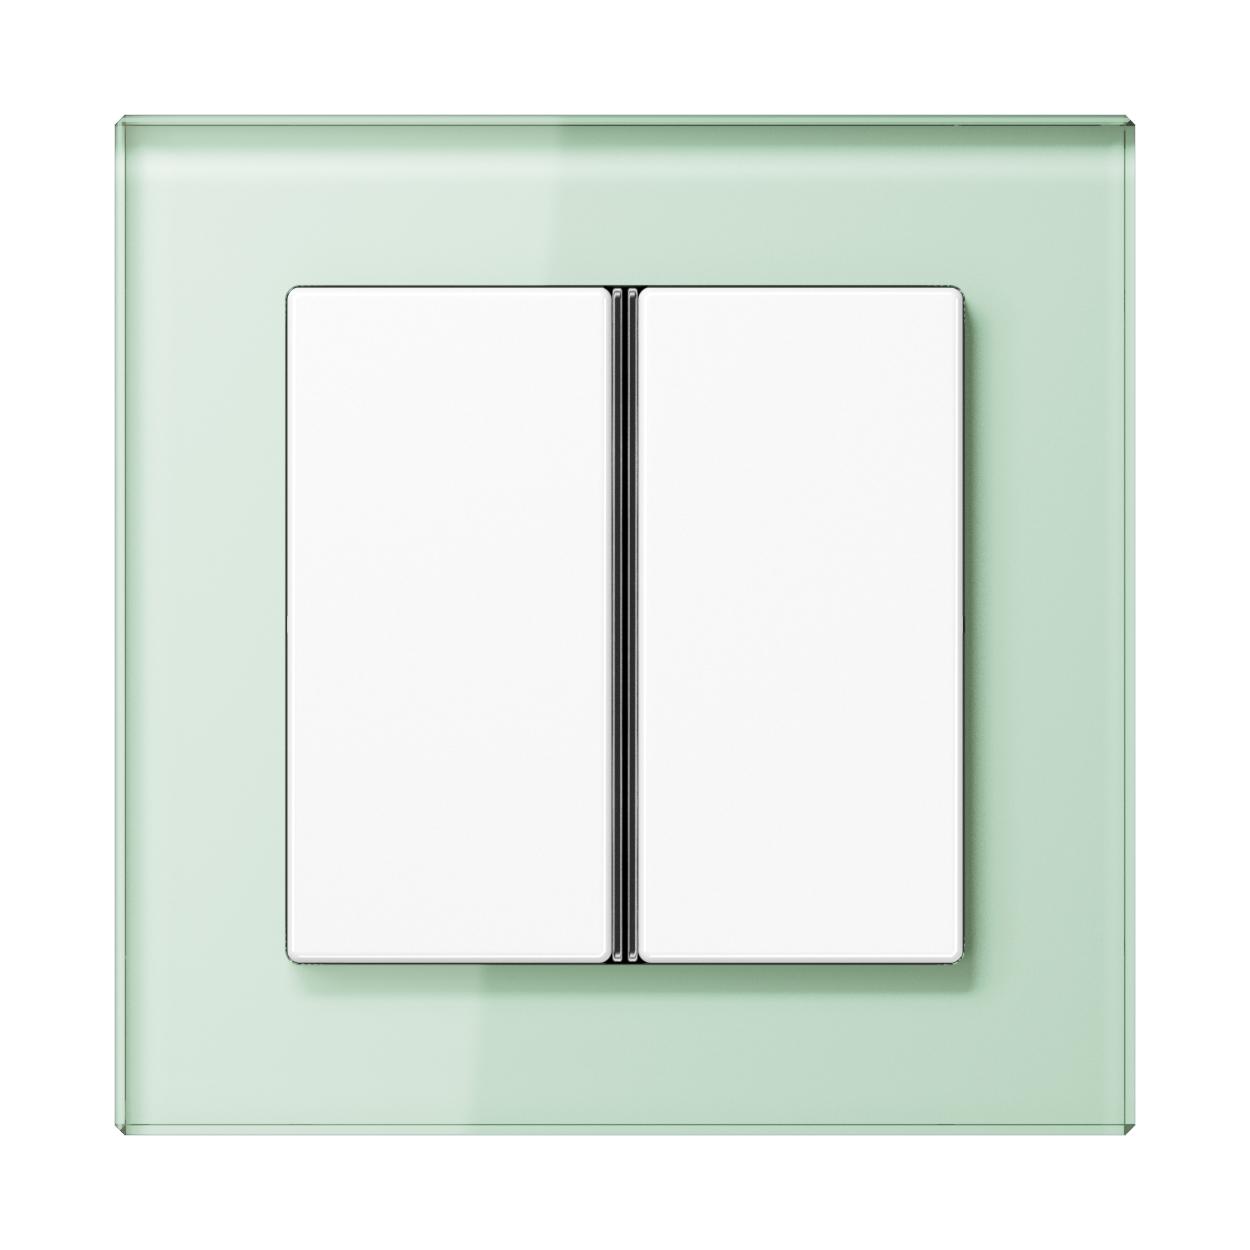 JUNG_AC_GL_soft-white_2button